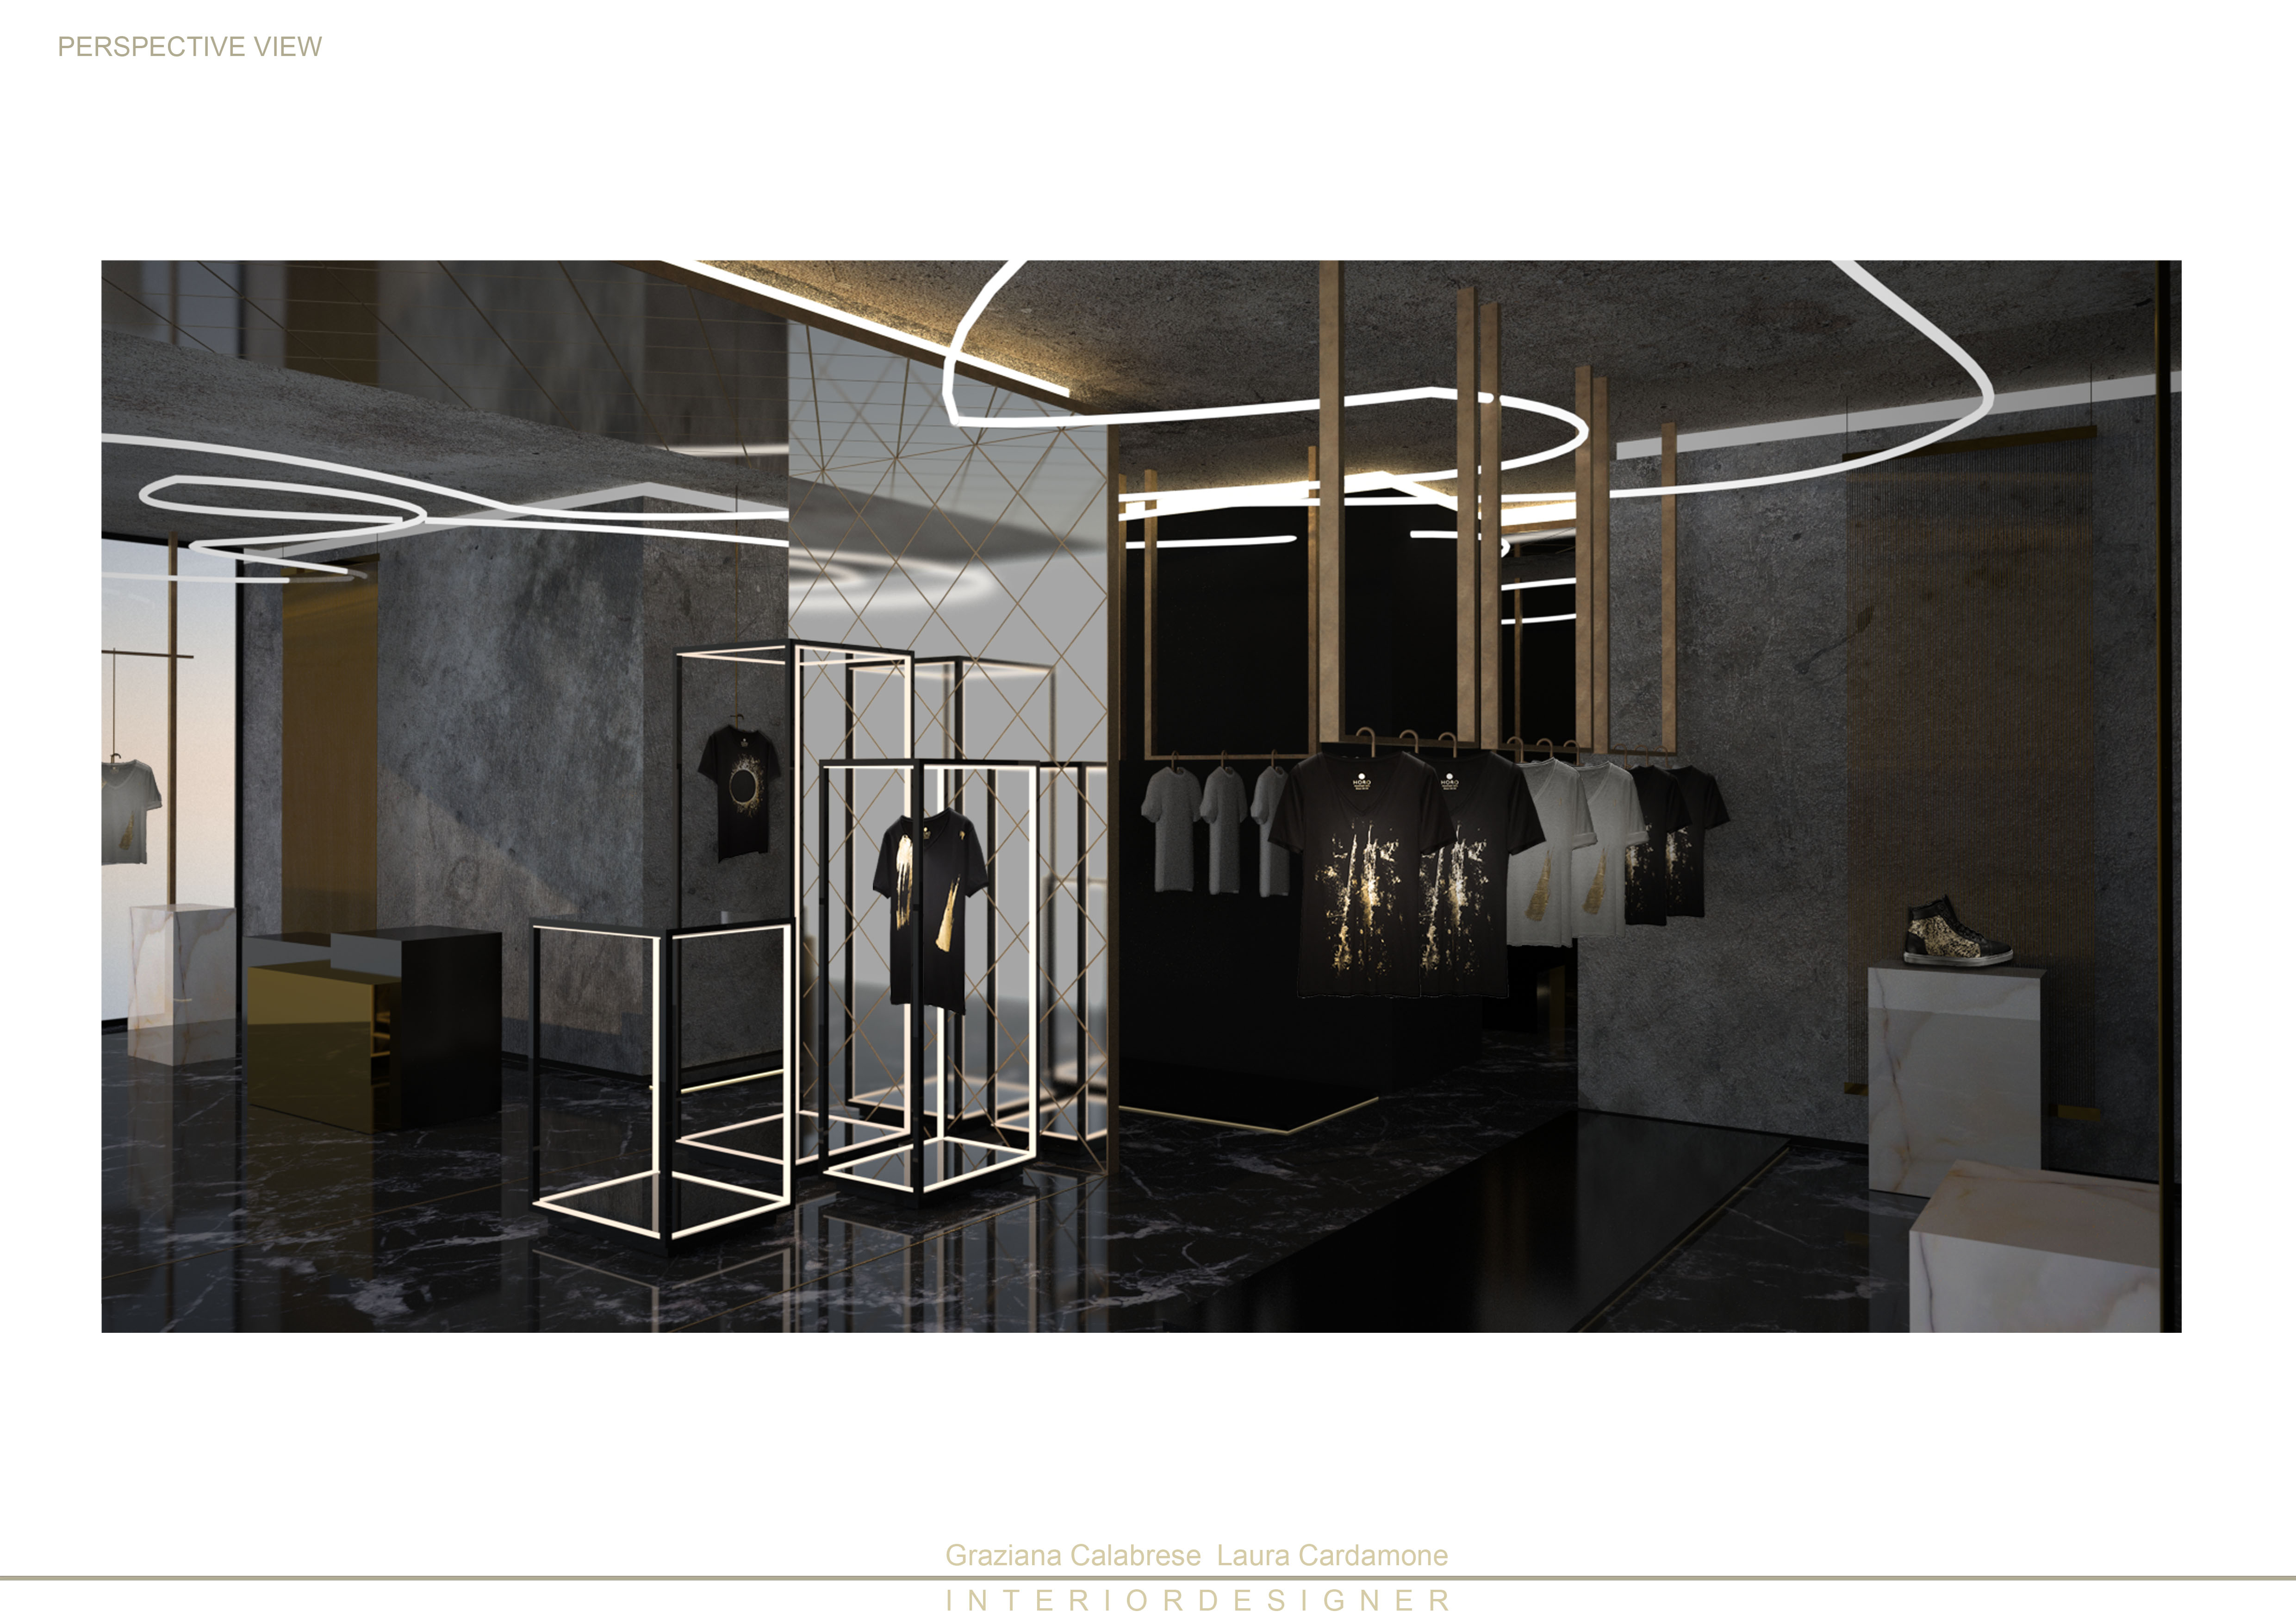 Corsi interior design bari - Interior design bari ...